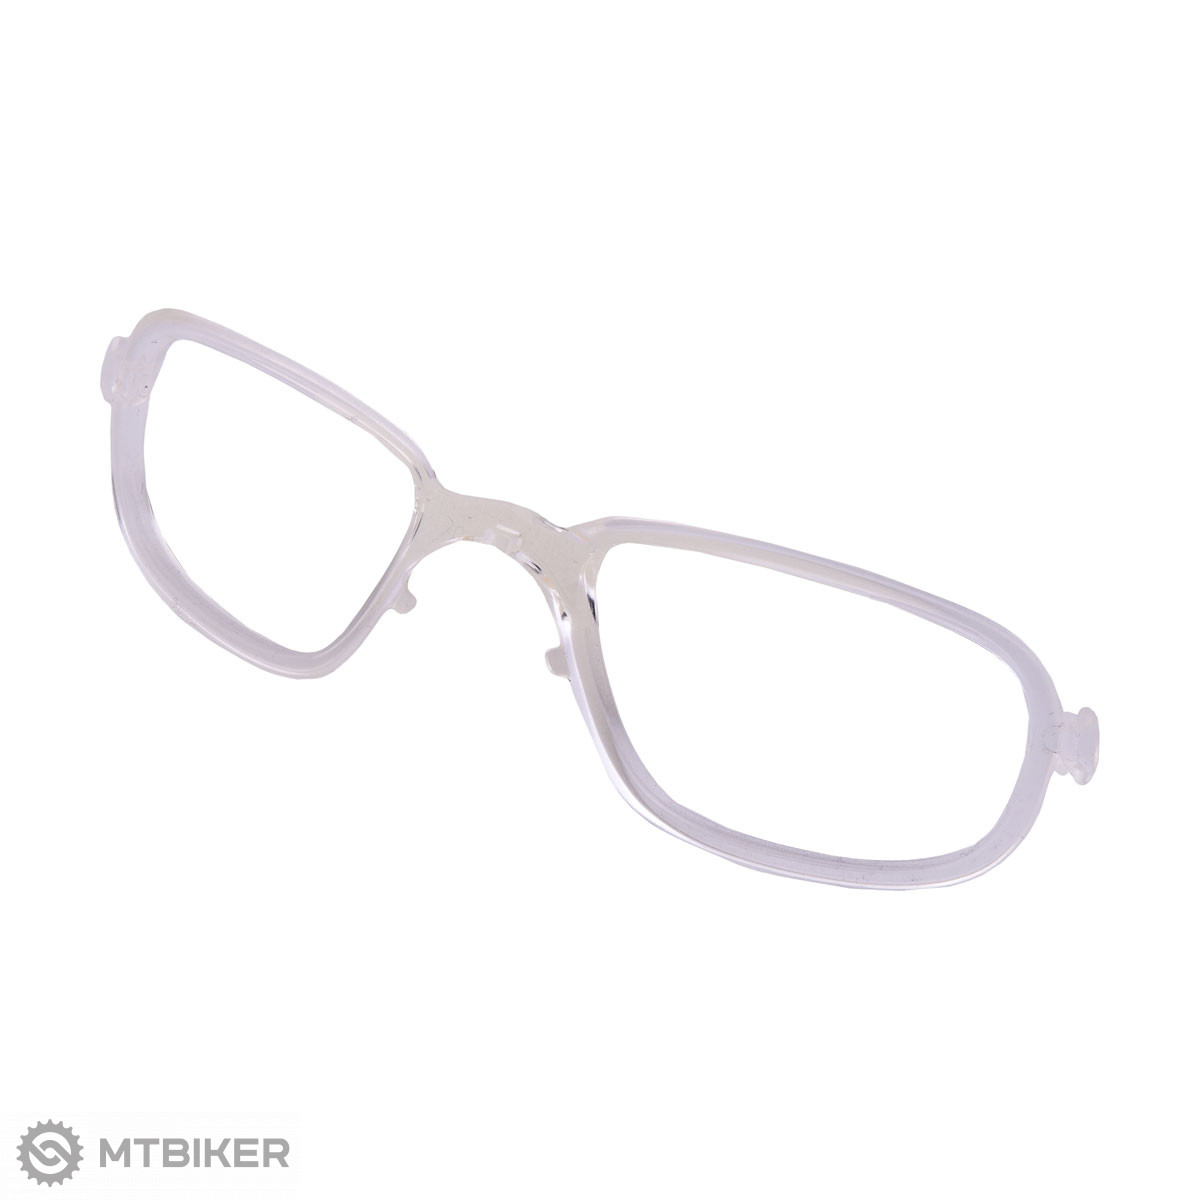 HQBC okuliare QX3 PLUS čierna Photochromic HQBC okuliare QX3 PLUS čierna  Photochromic 17d18b1a4df